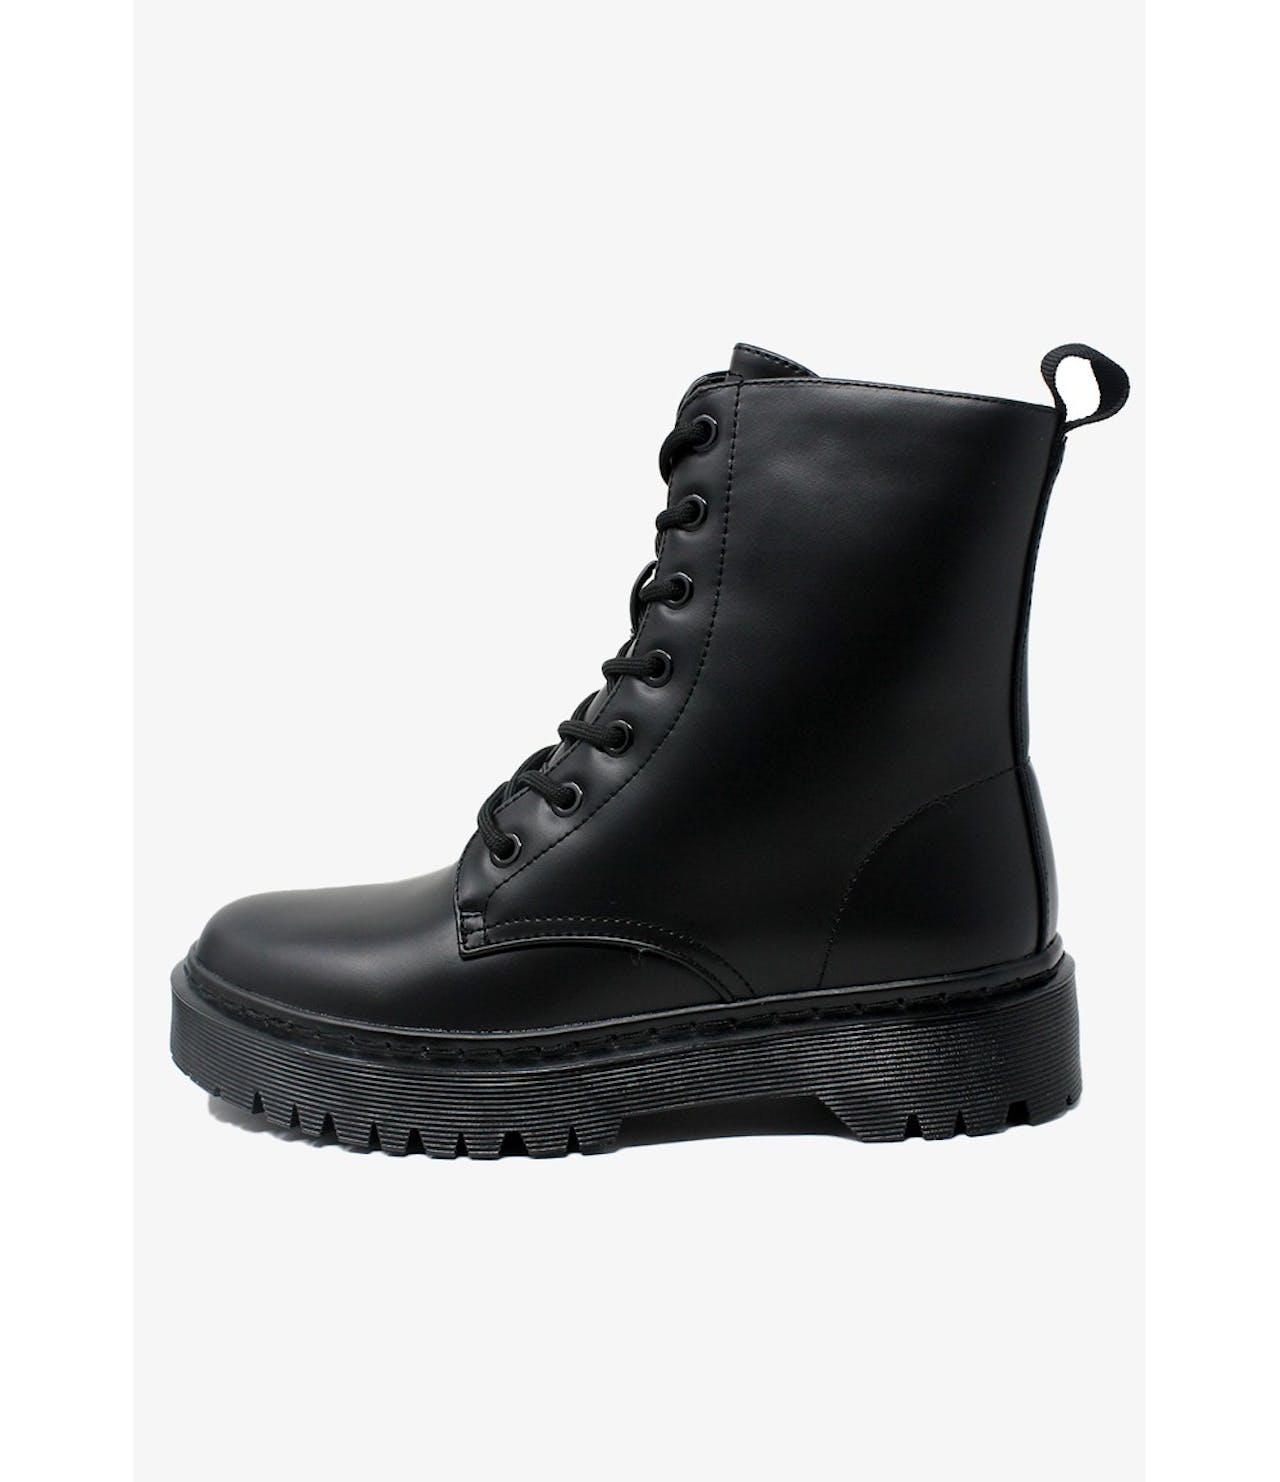 Shoe Lounge  Black Faux Leather 7 Eye Work Boot